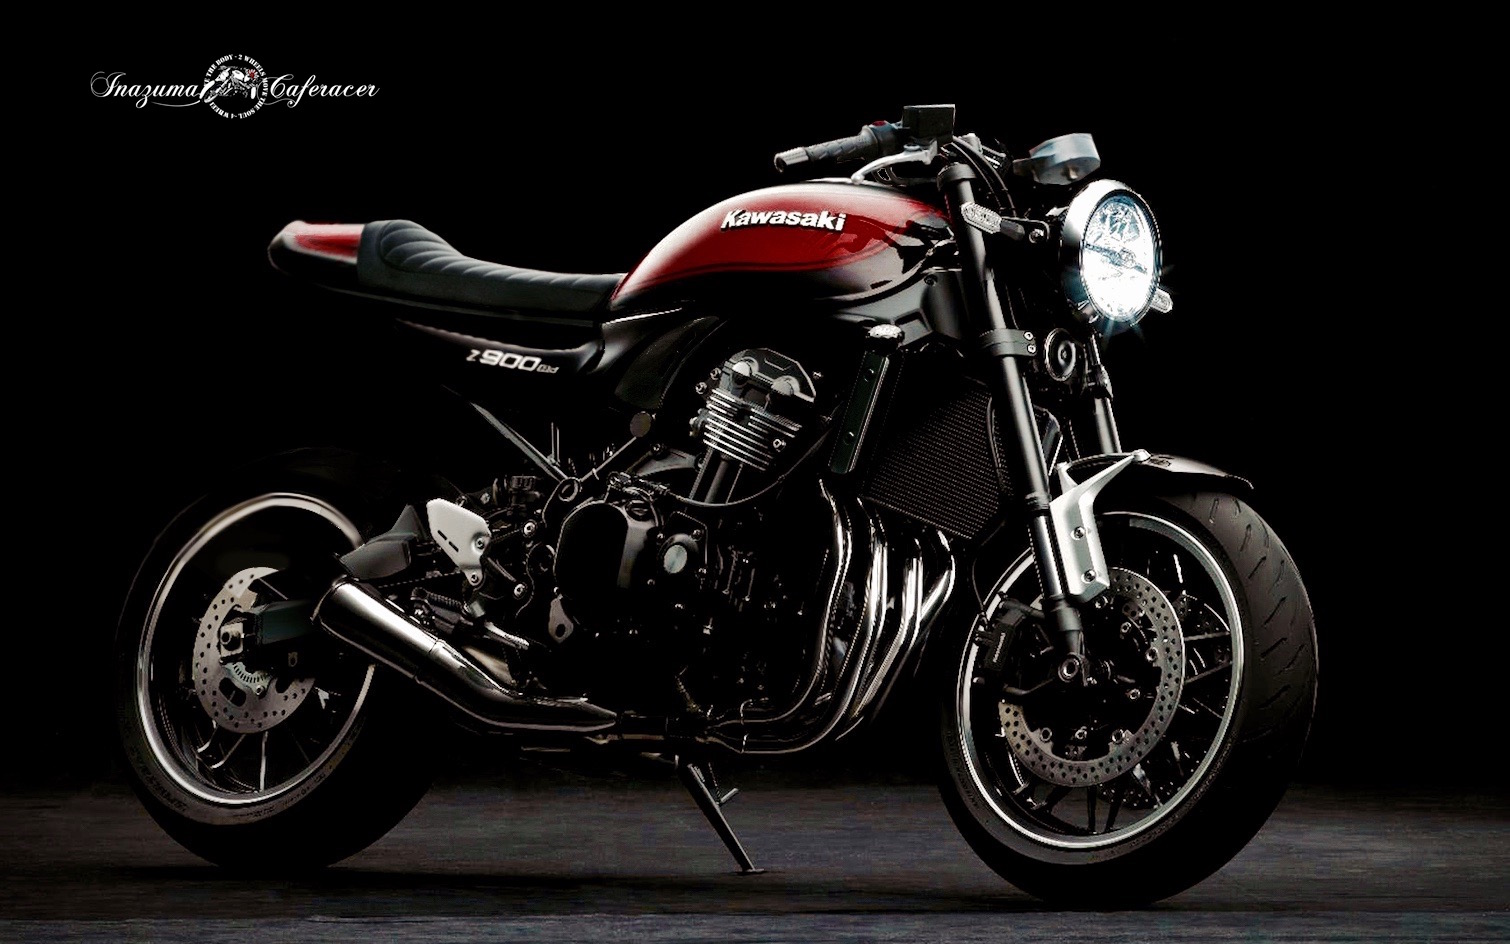 Kawasaki Z900 RS Inazumized How Do You Like It